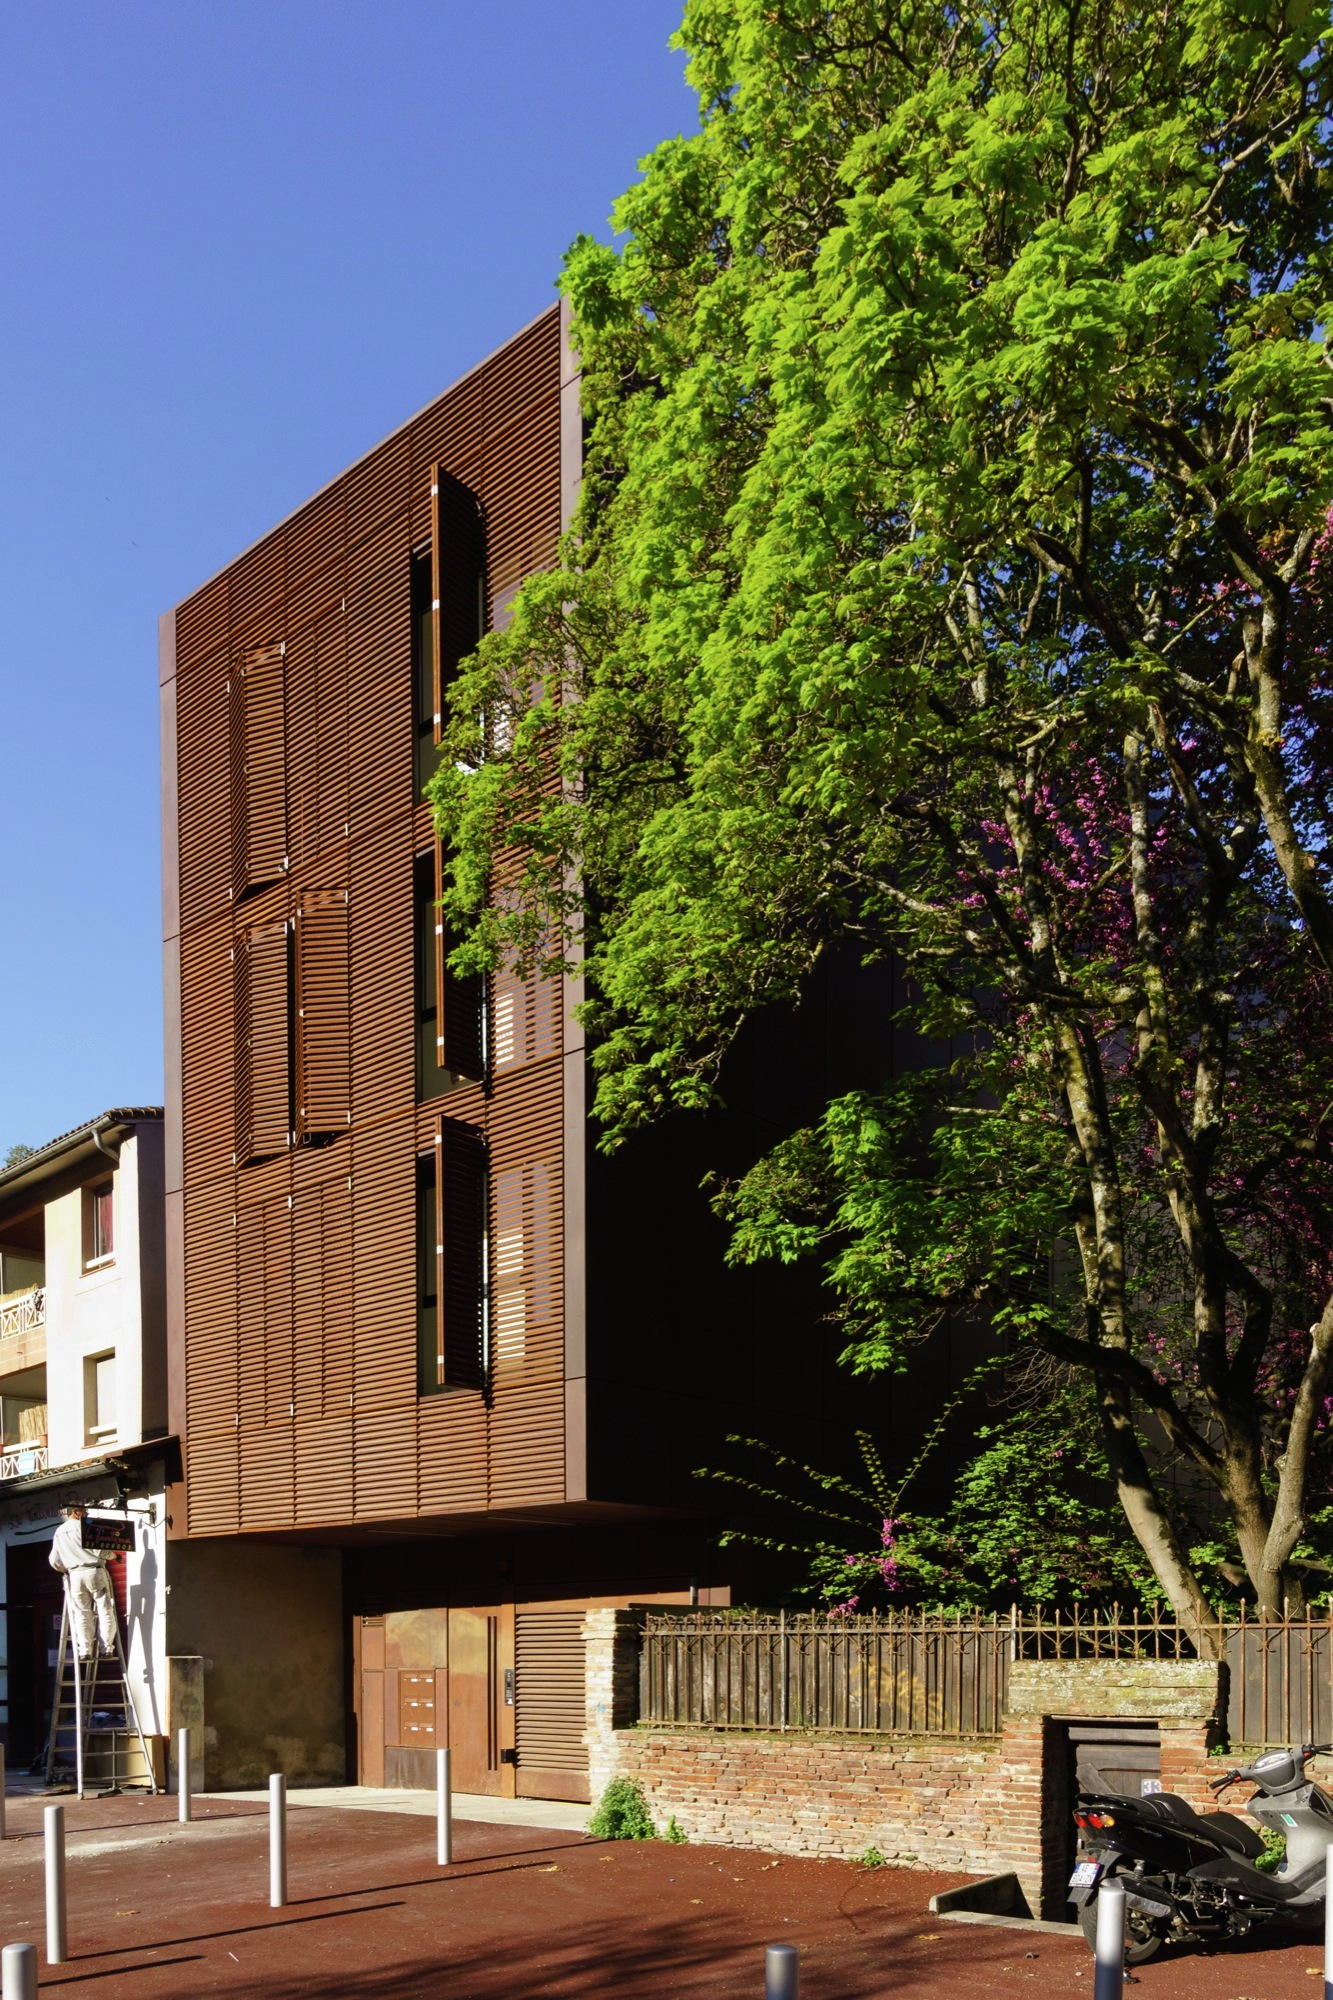 galer a de residencia yaoitcha taillandier architectes associ s 2. Black Bedroom Furniture Sets. Home Design Ideas